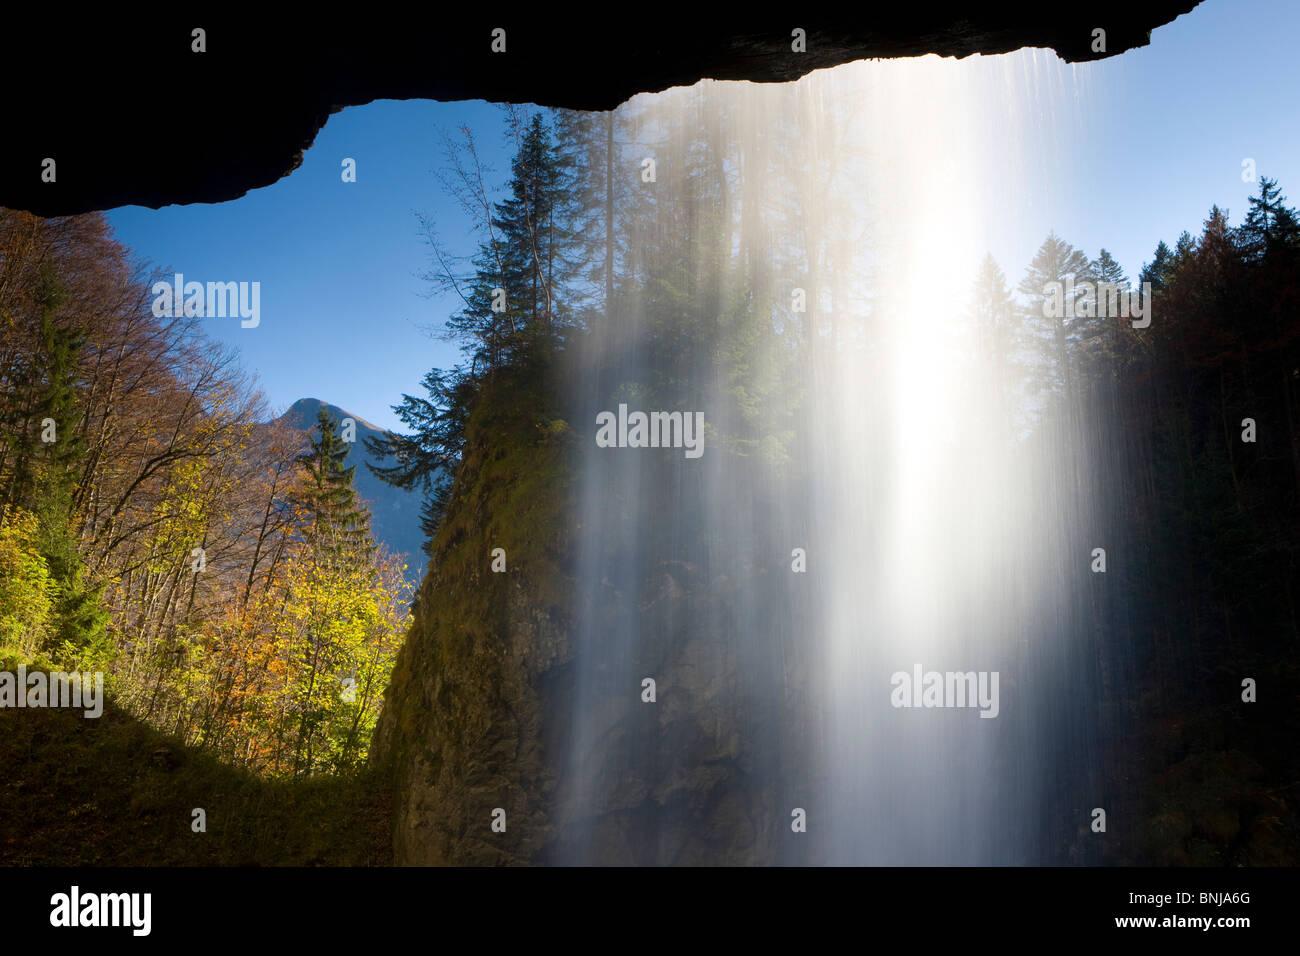 Berglistüber Switzerland Canton of Glarus waterfall brook creek wood forest autumn fall water curtain rock - Stock Image